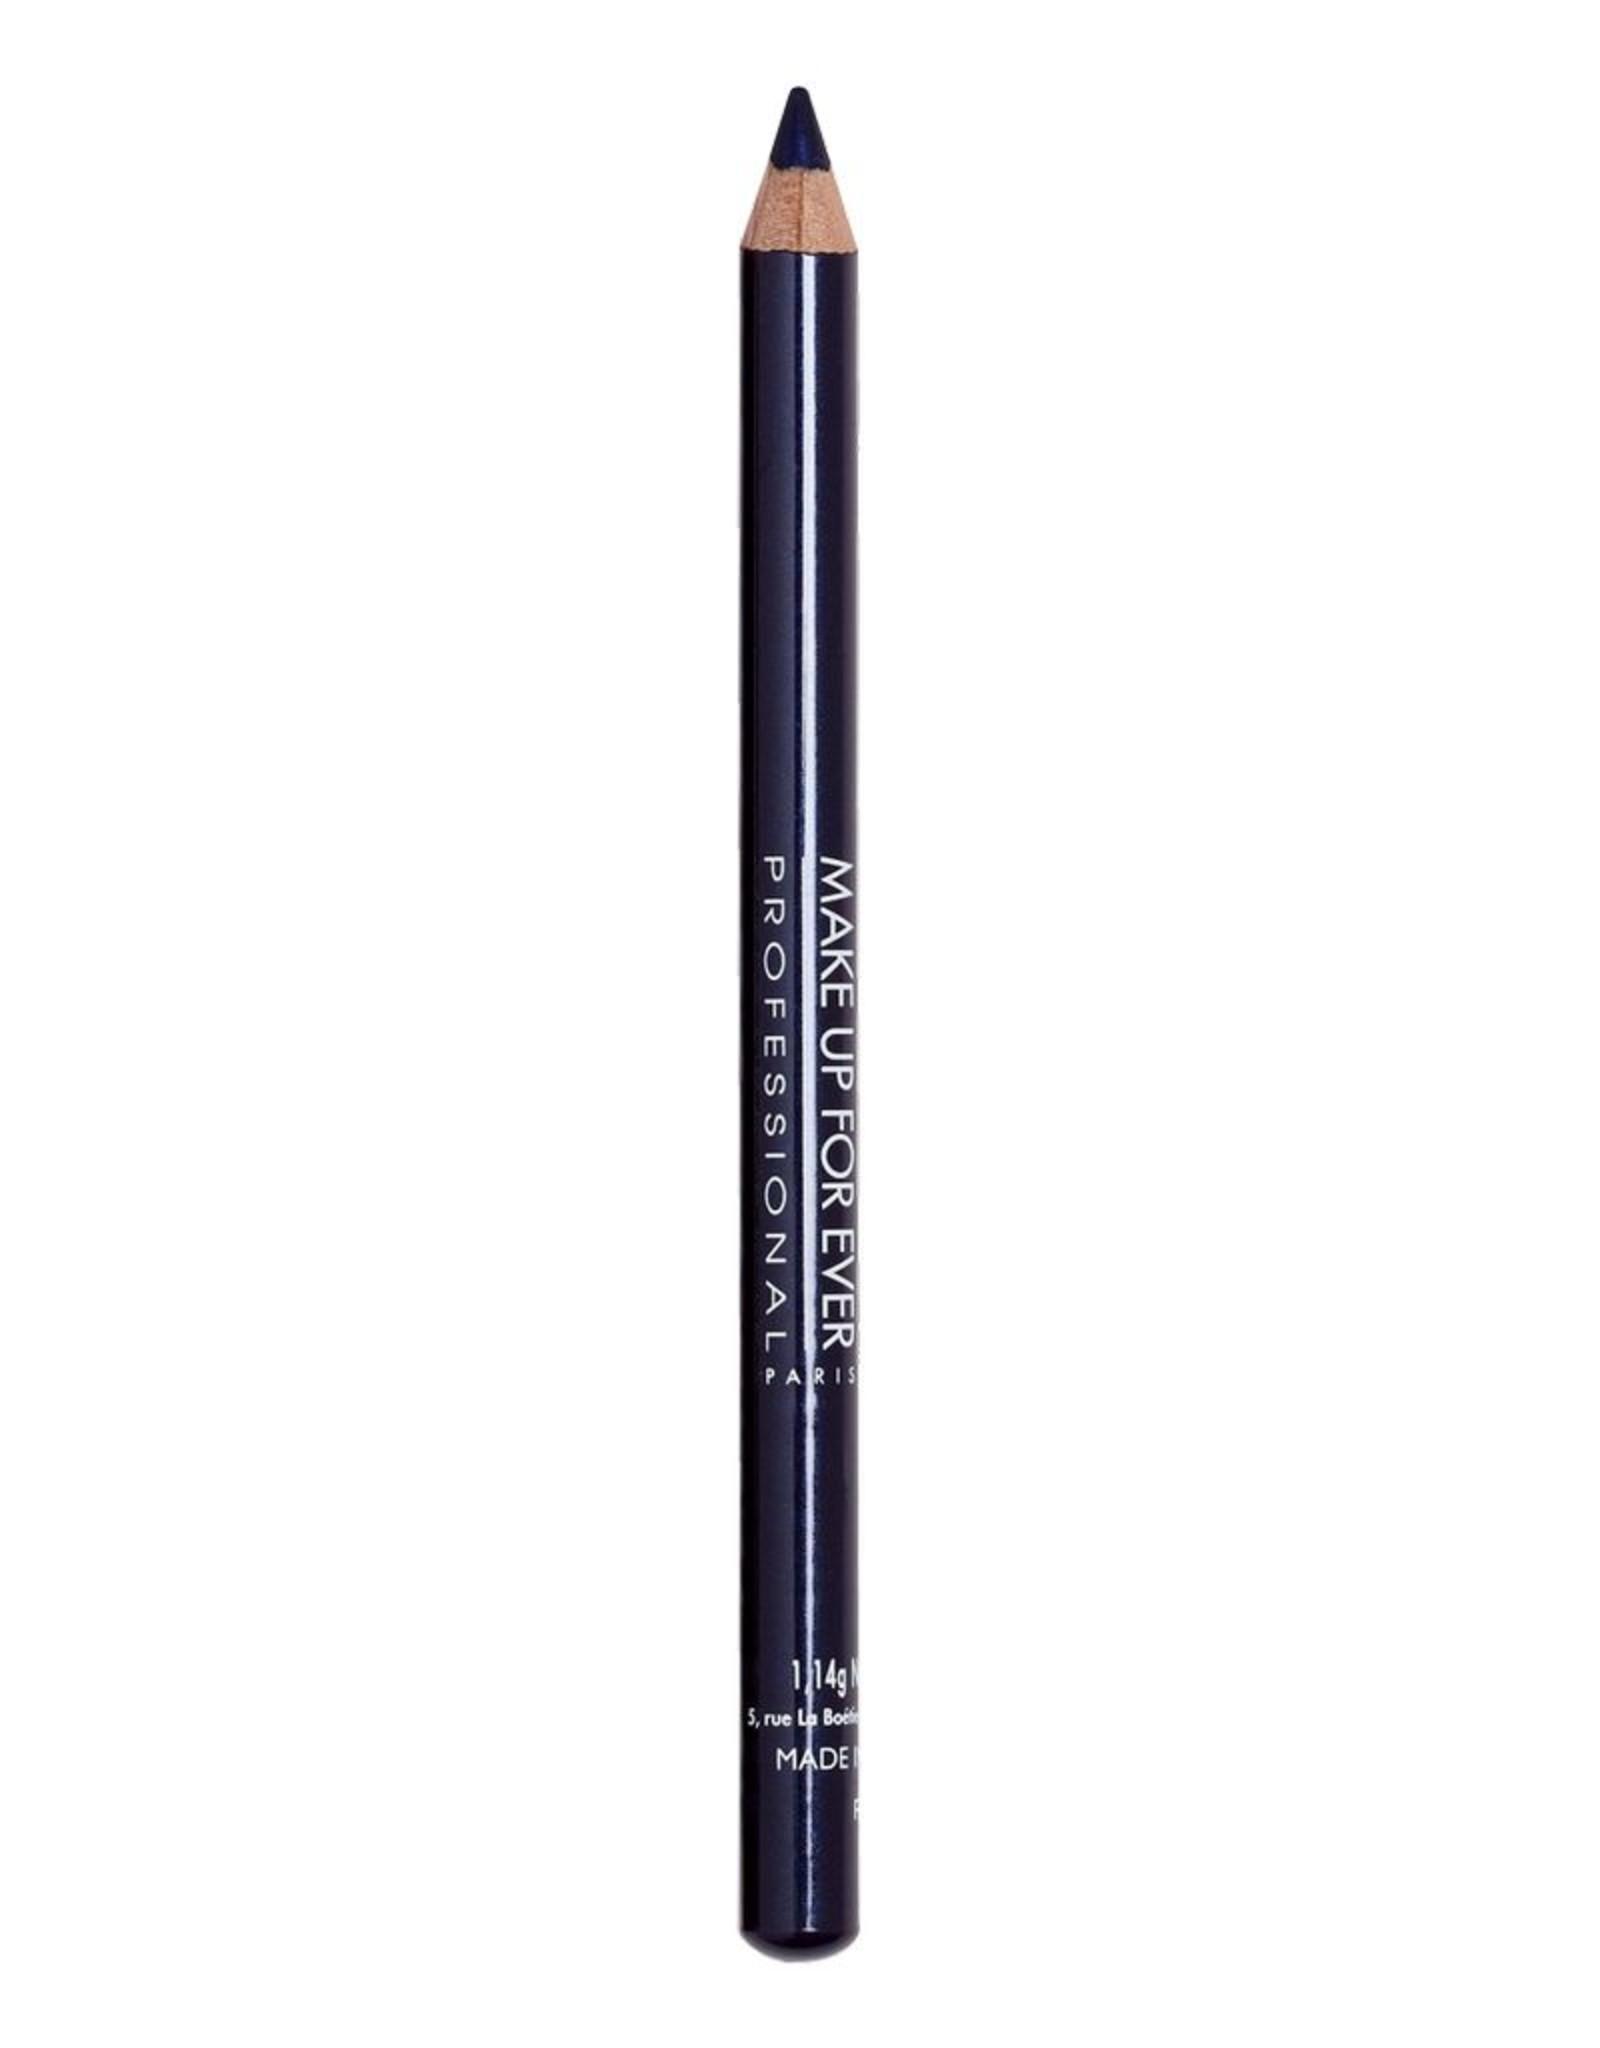 MUFE CRAYON KHOL 1,14g10K - noir violet nacre / pearly black purple   (MB391 Smoky Couleur)